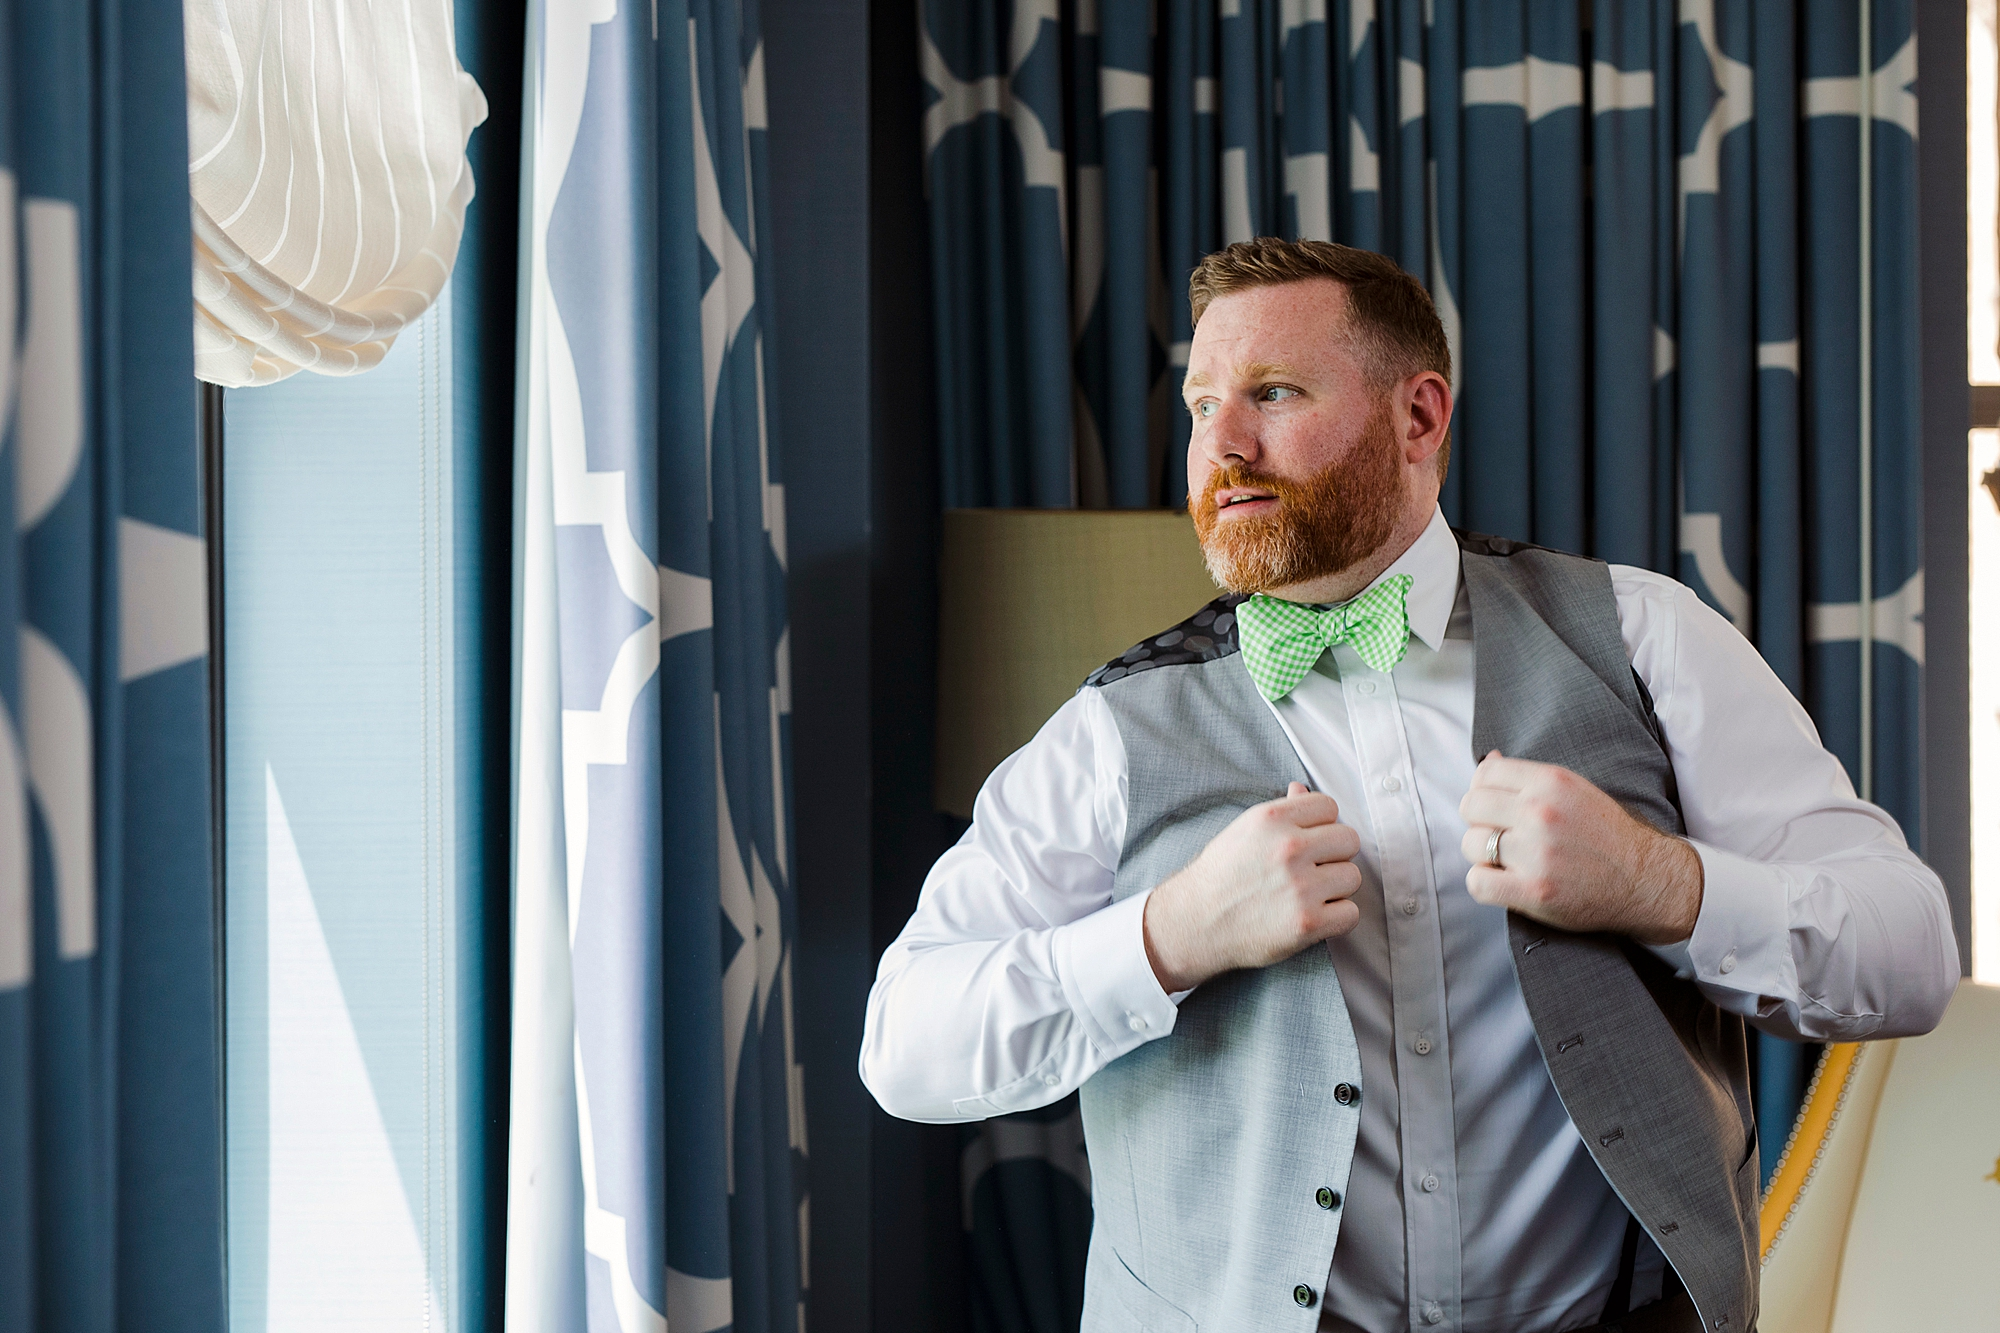 Dan_and_Byron_Love_by_Joe_Mac_Philadelphia_Wedding_LGBTQ_Photography_Gay_Independence_visitor_Center_18.JPG